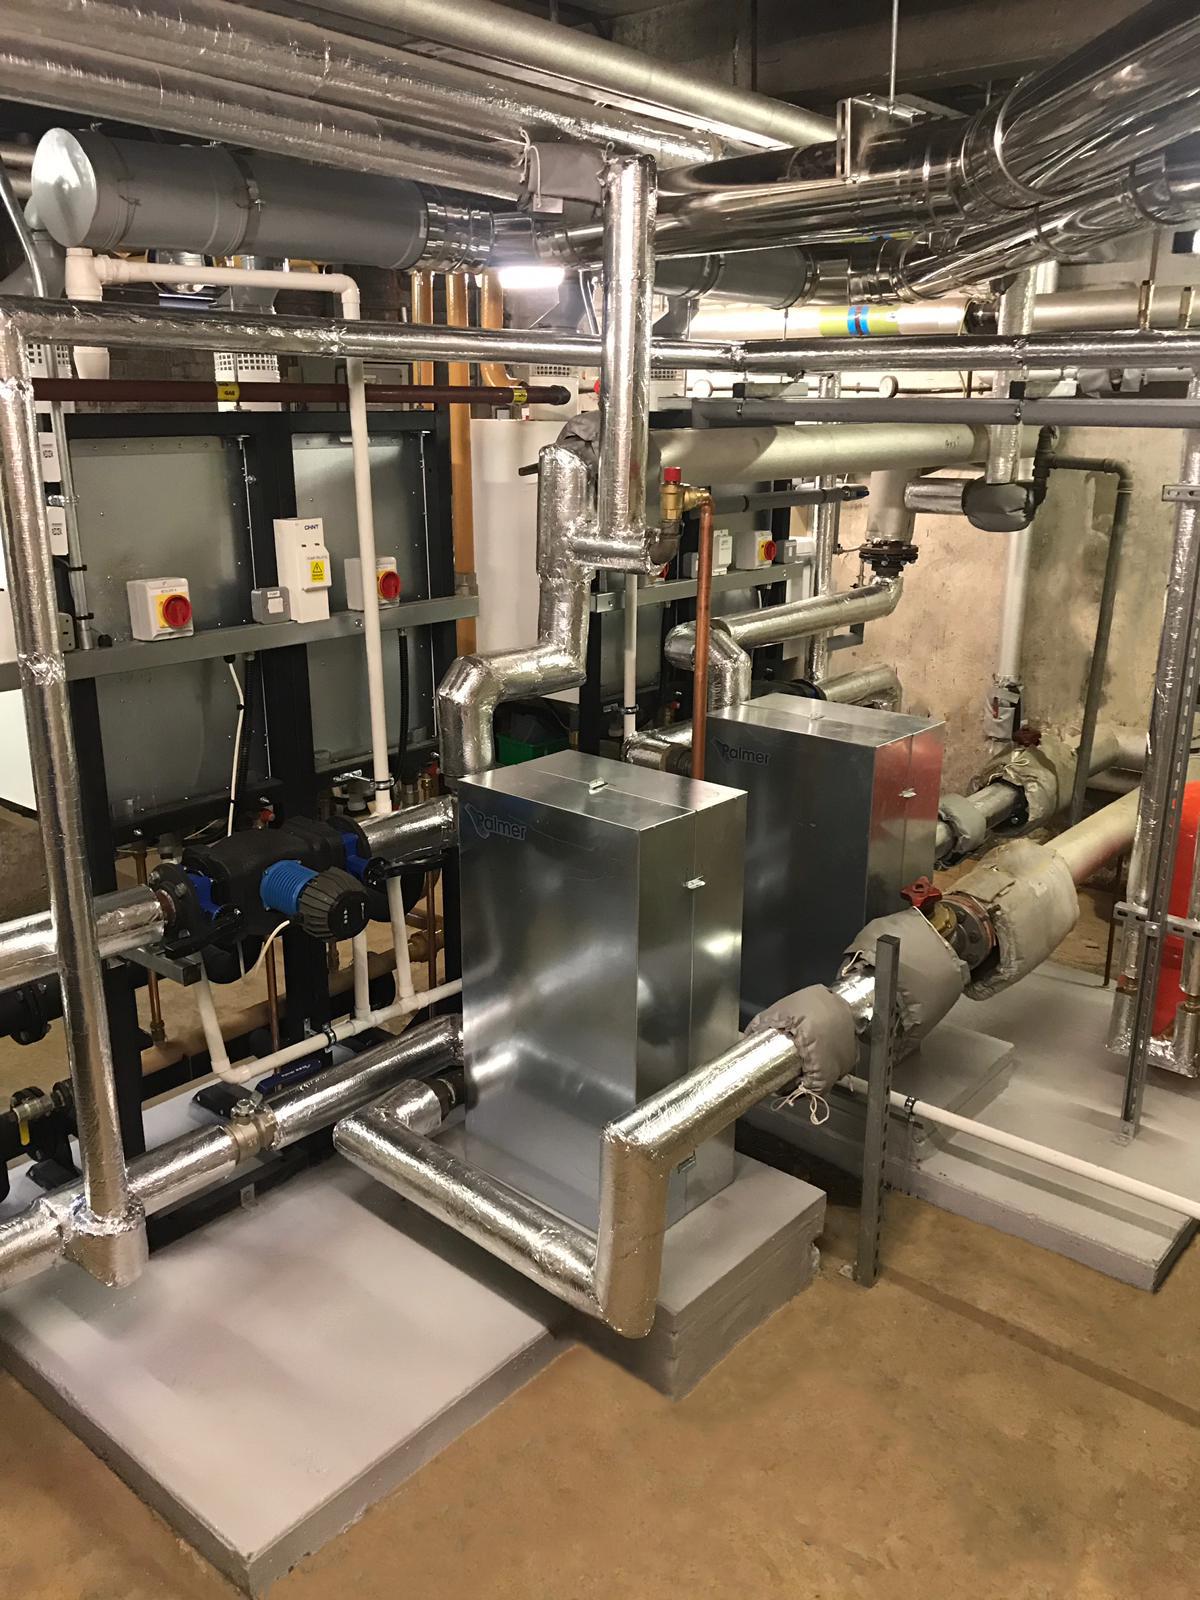 Rear of school Plant Room Showing Heat exchangers